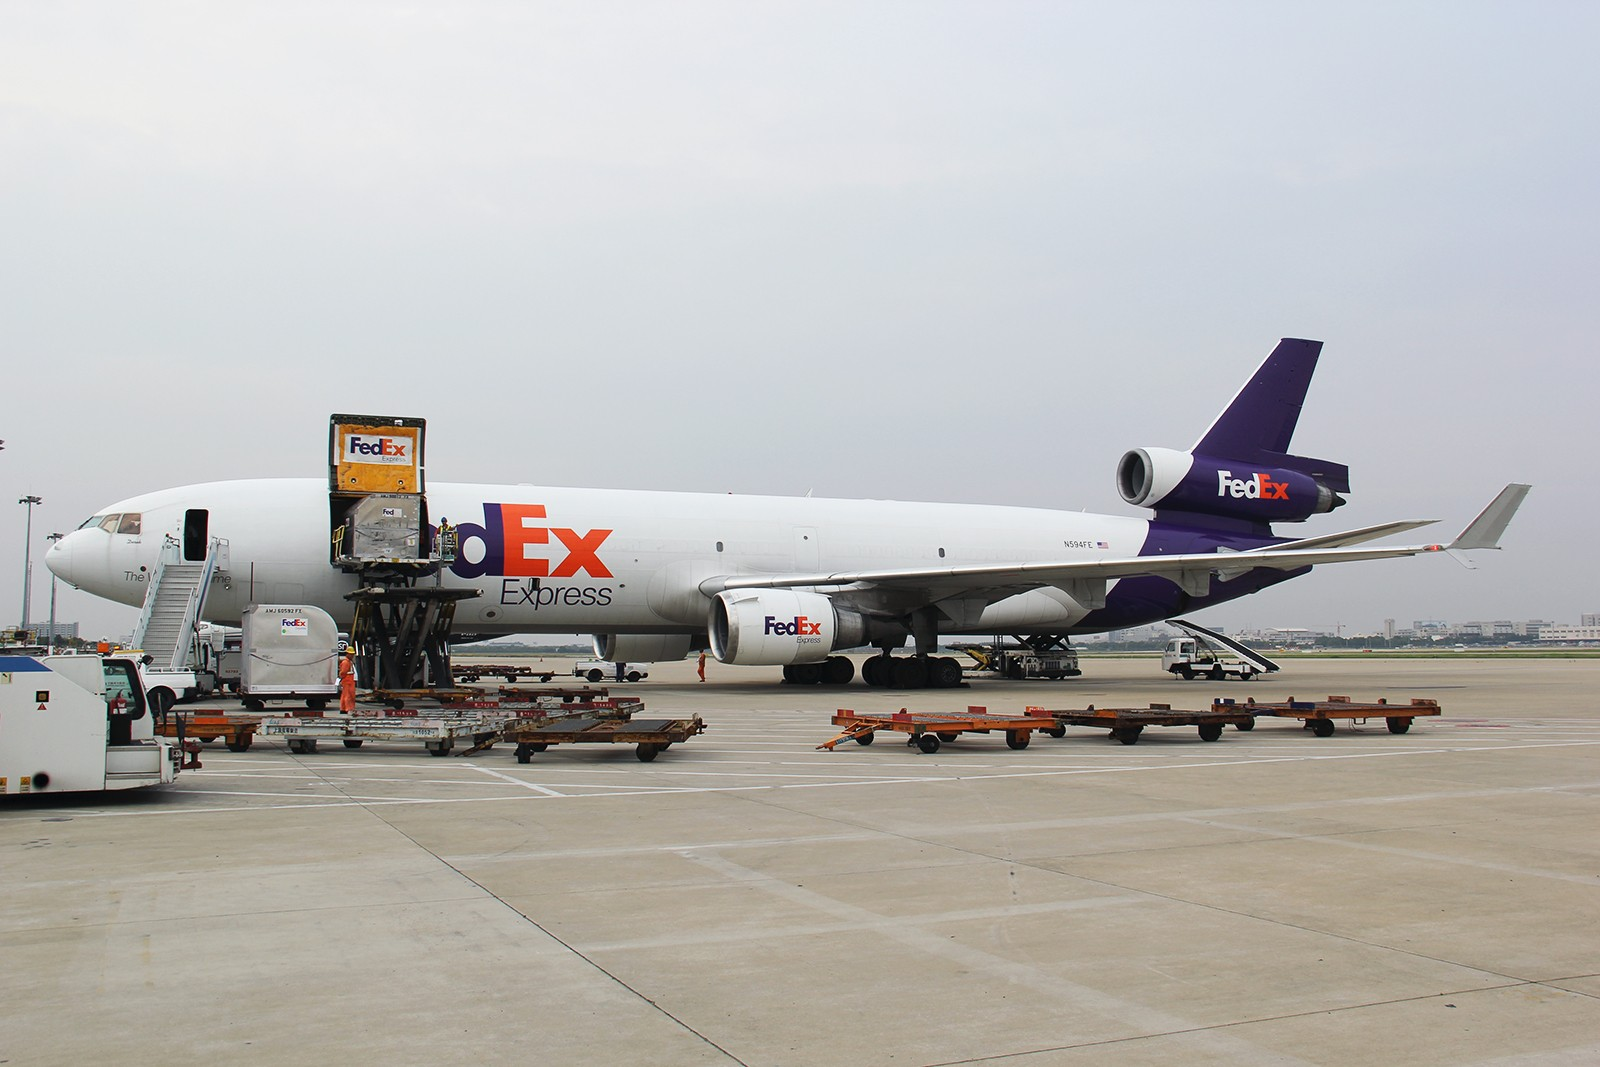 Re:【上海飞友会】时隔大半年重返ZSPD内场 好货不断不加水印大放送 MCDONNELL DOUGLAS MD-11F N594FE 中国上海浦东国际机场